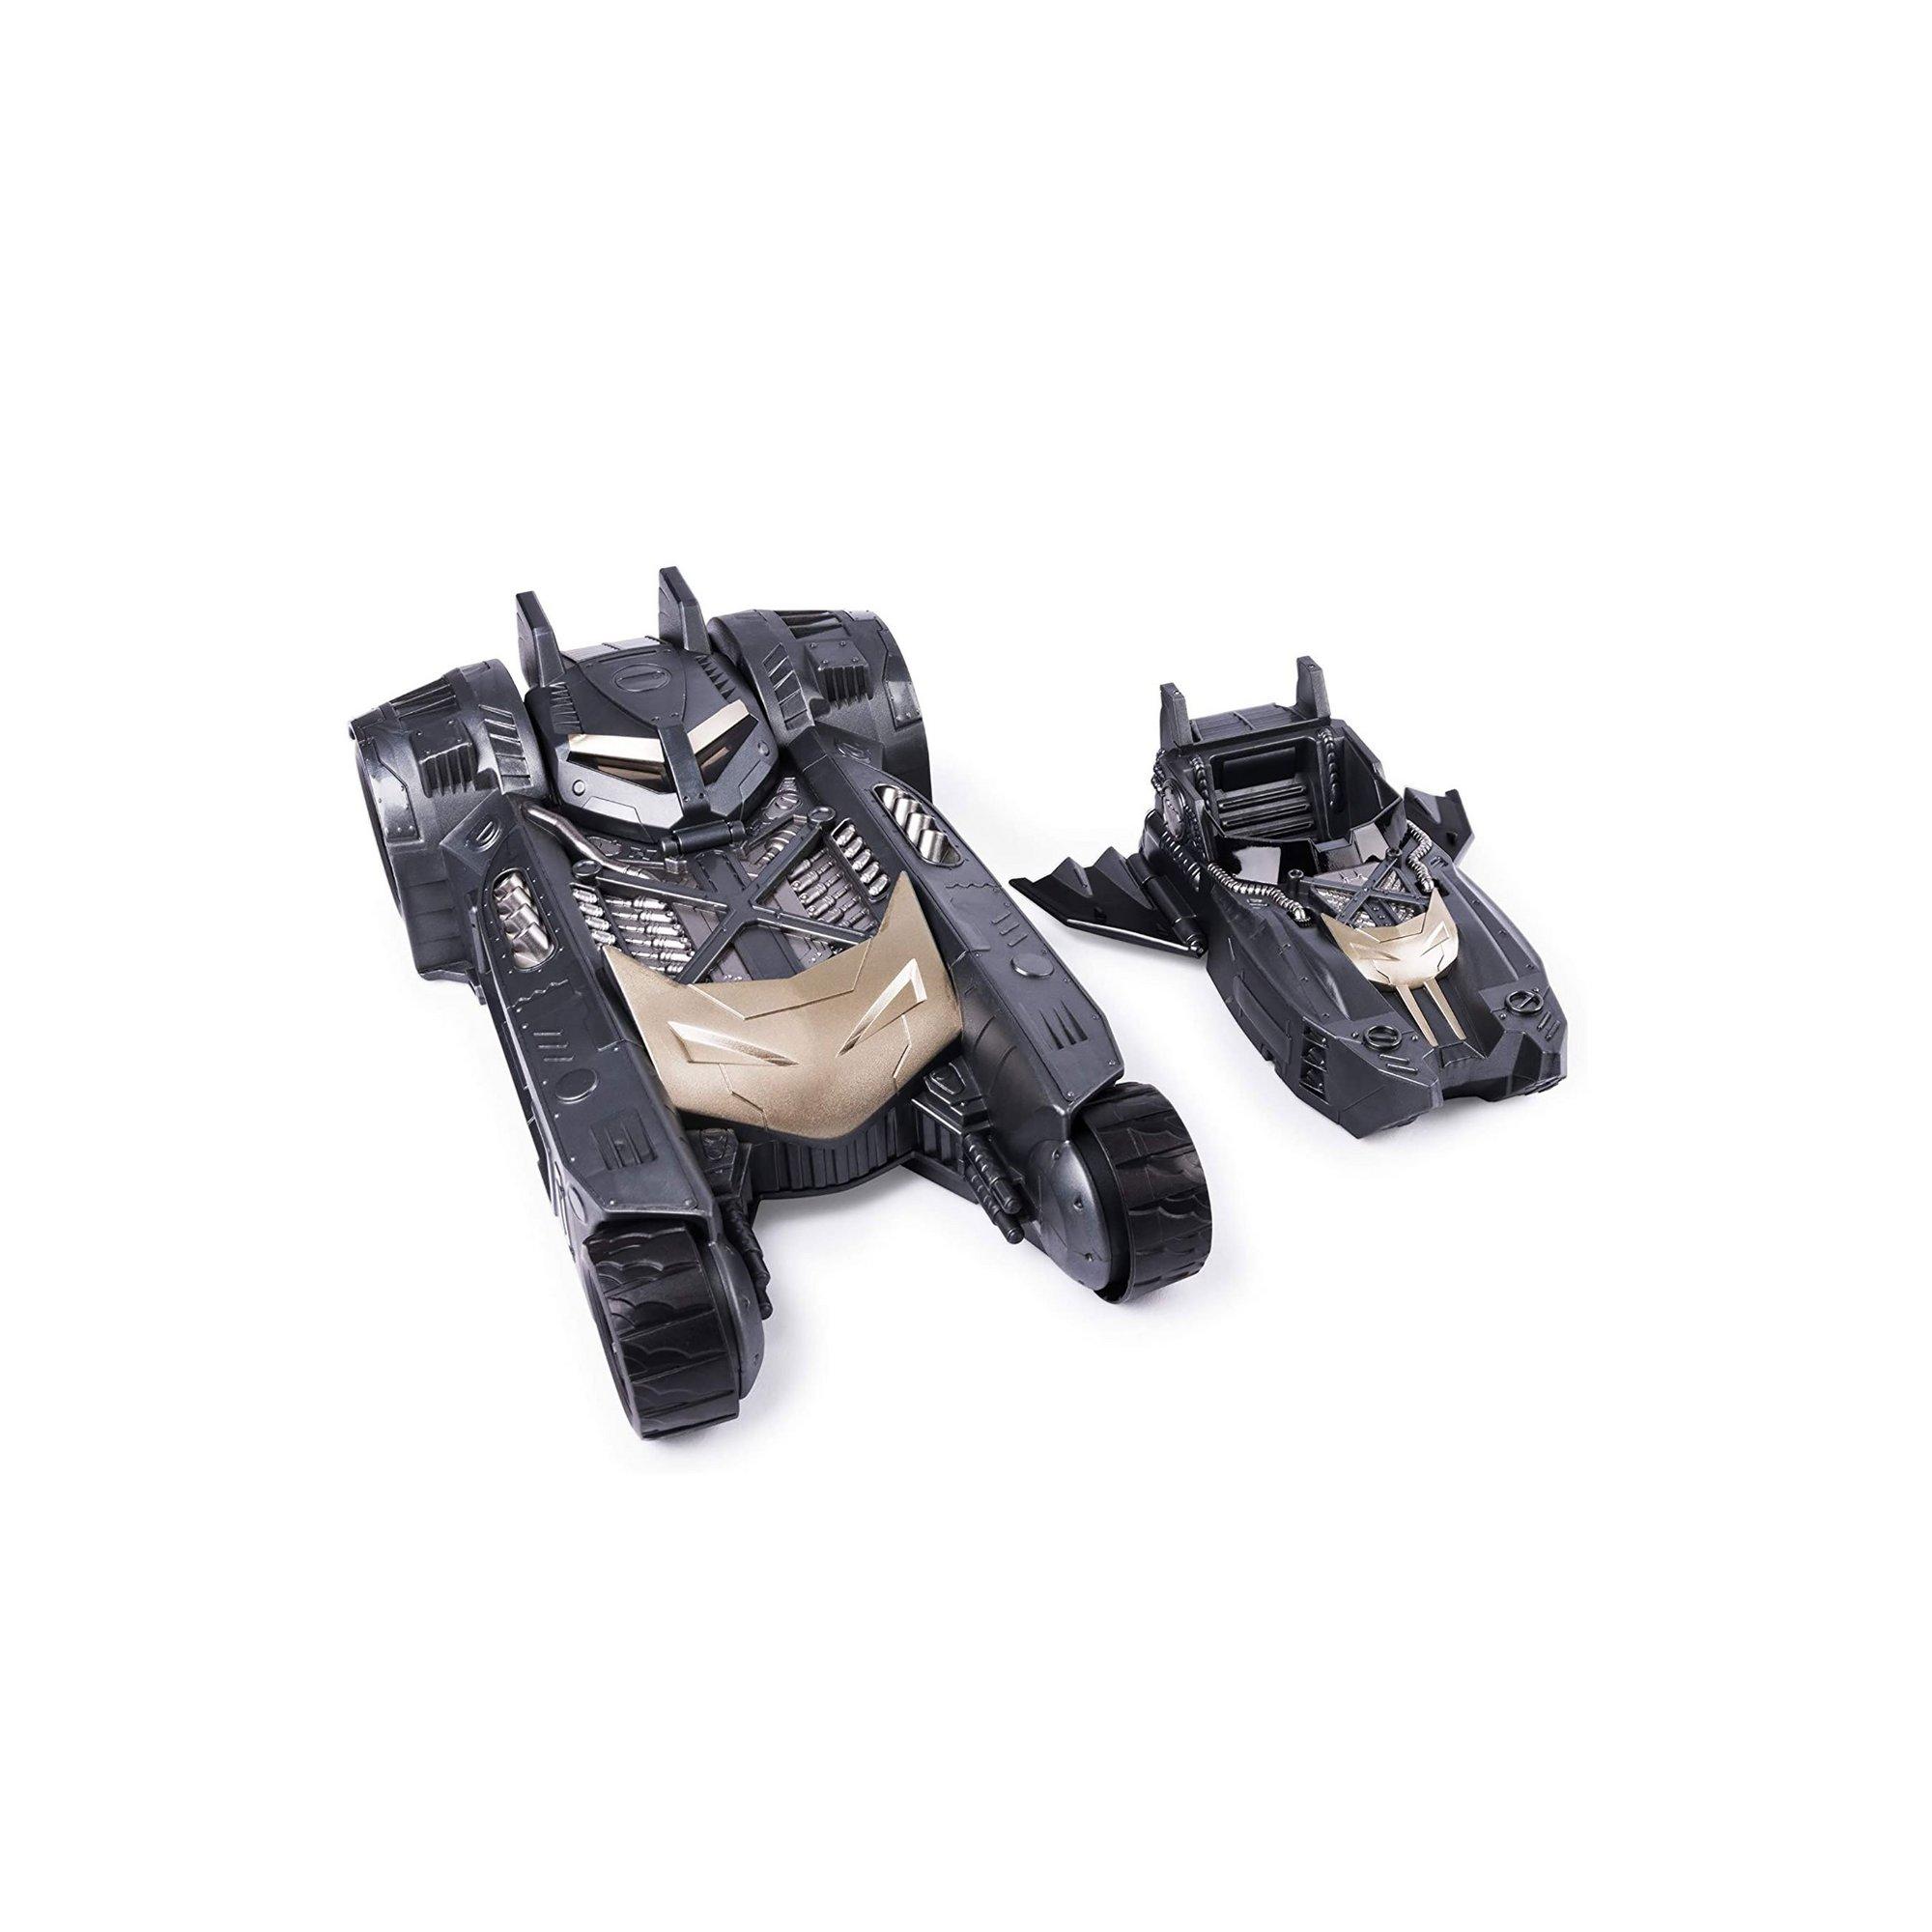 Image of 12 Inch Batmobile and Batboat